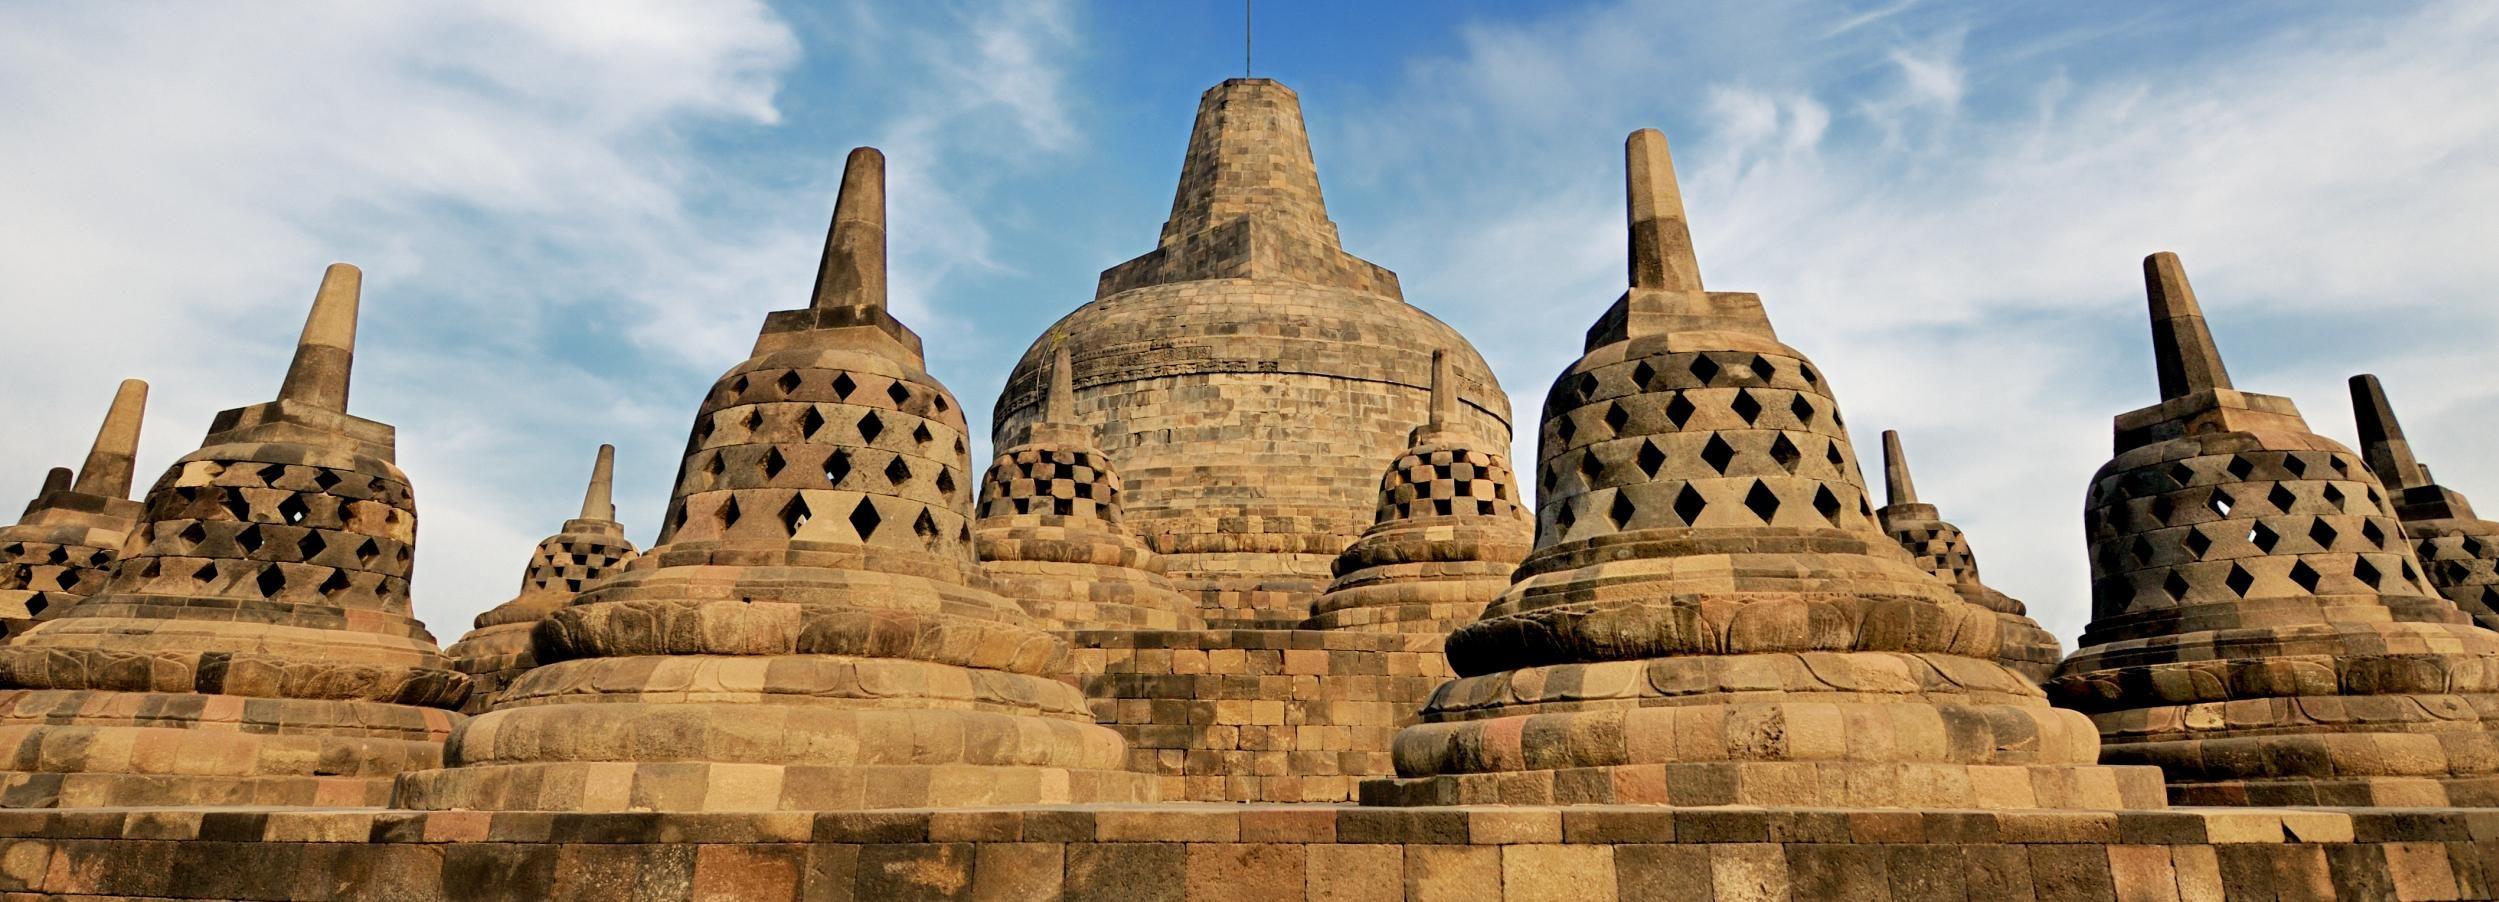 Borobudur Temple Half Day Private Tour